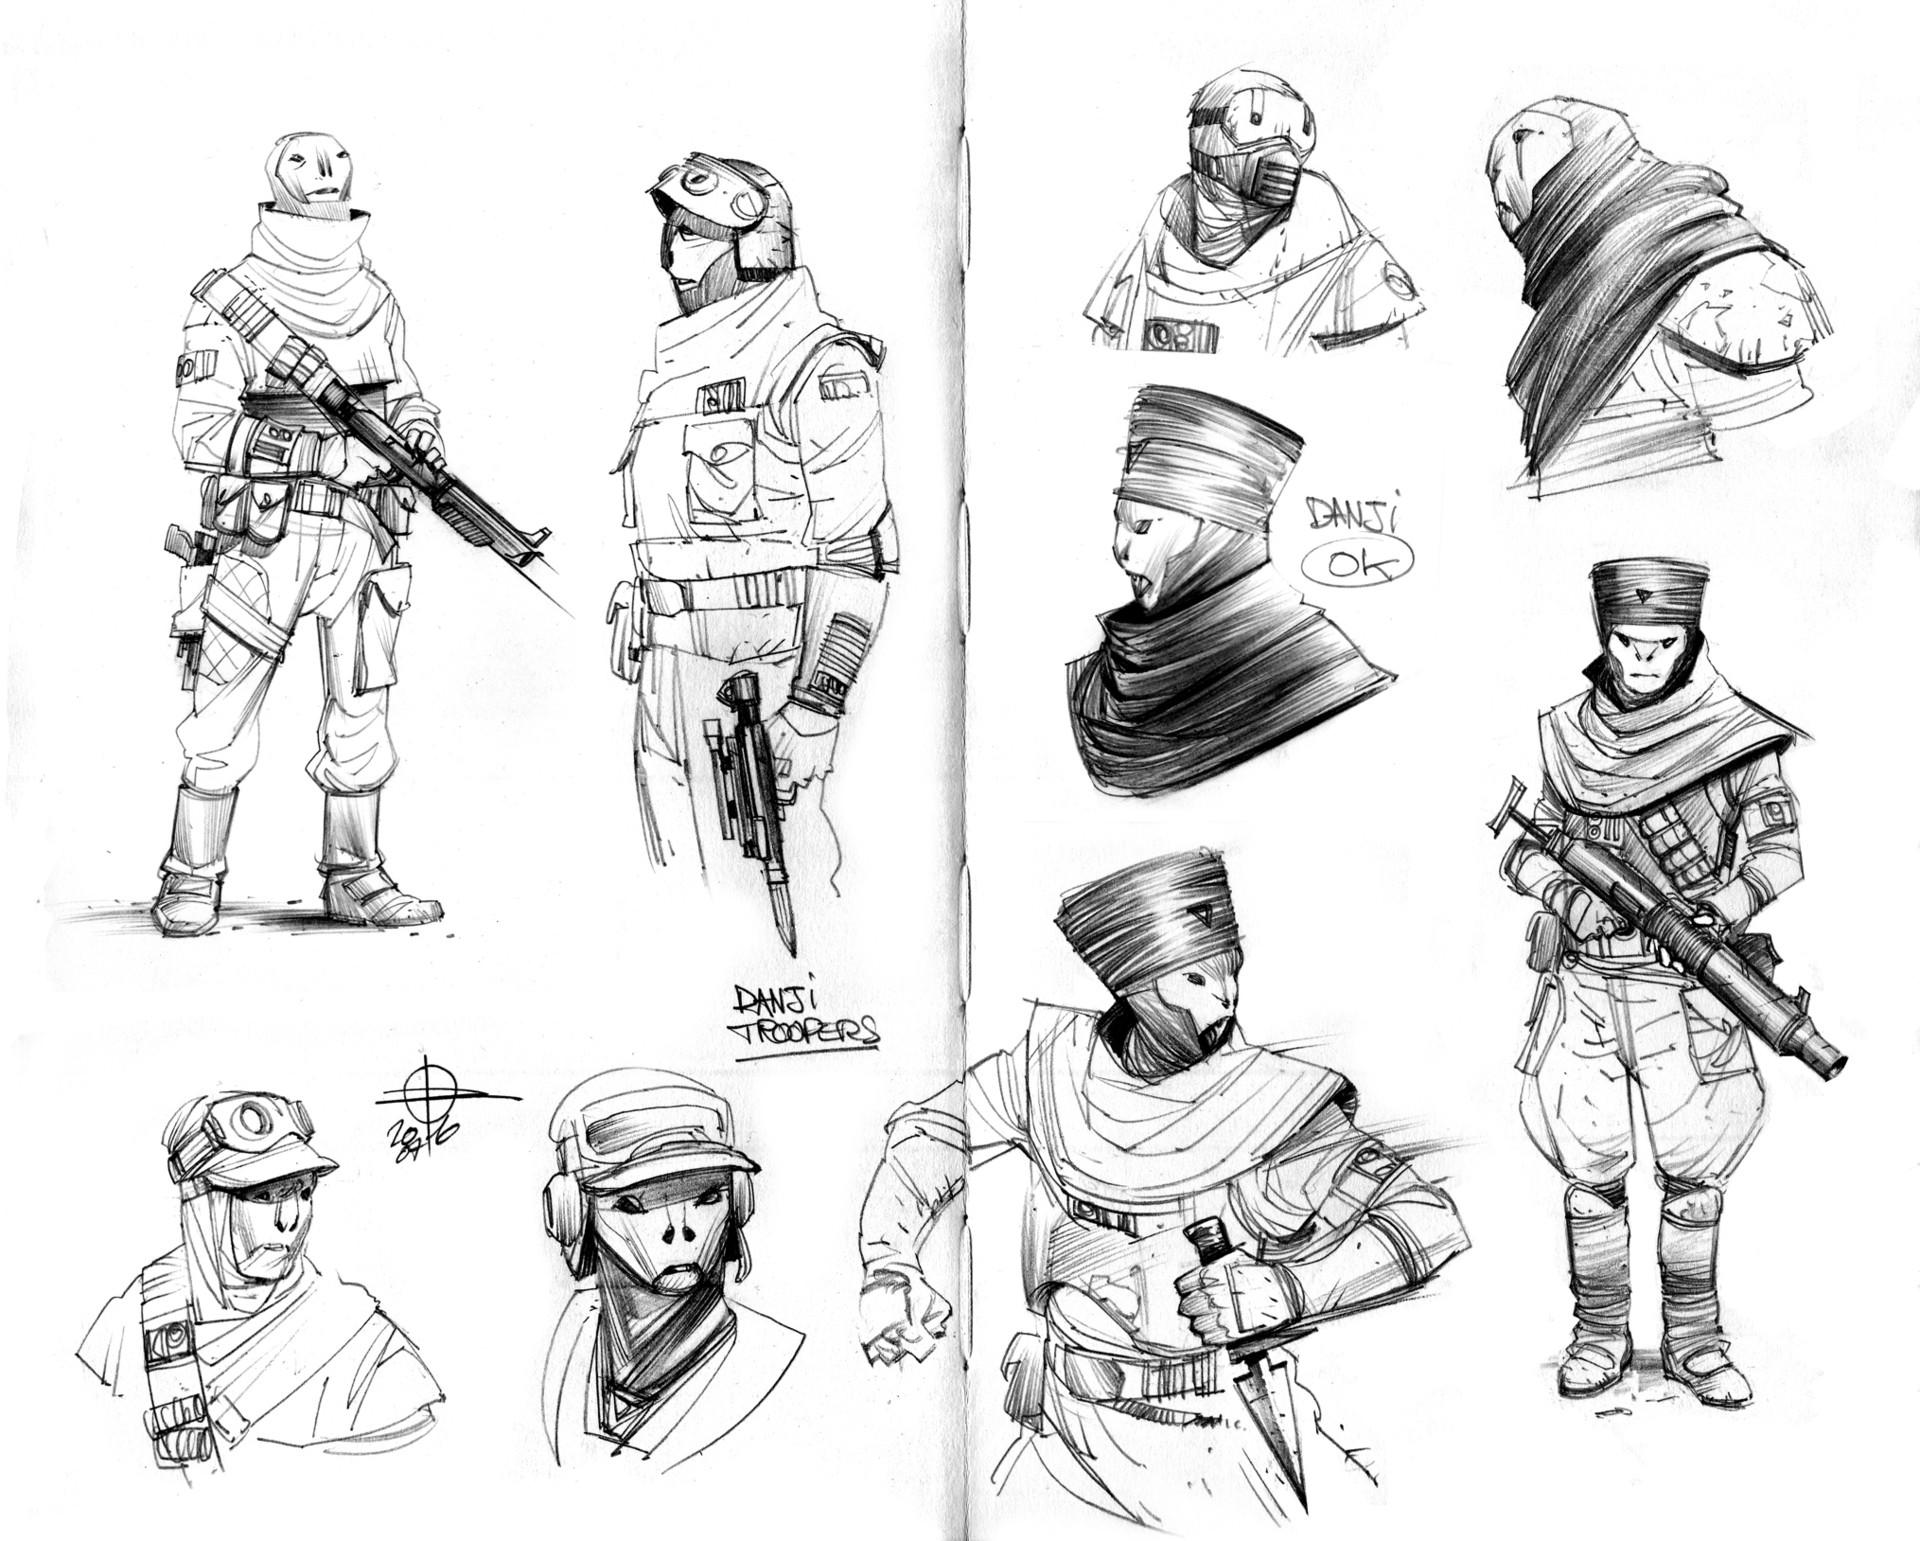 Renaud roche part03 sketches02b